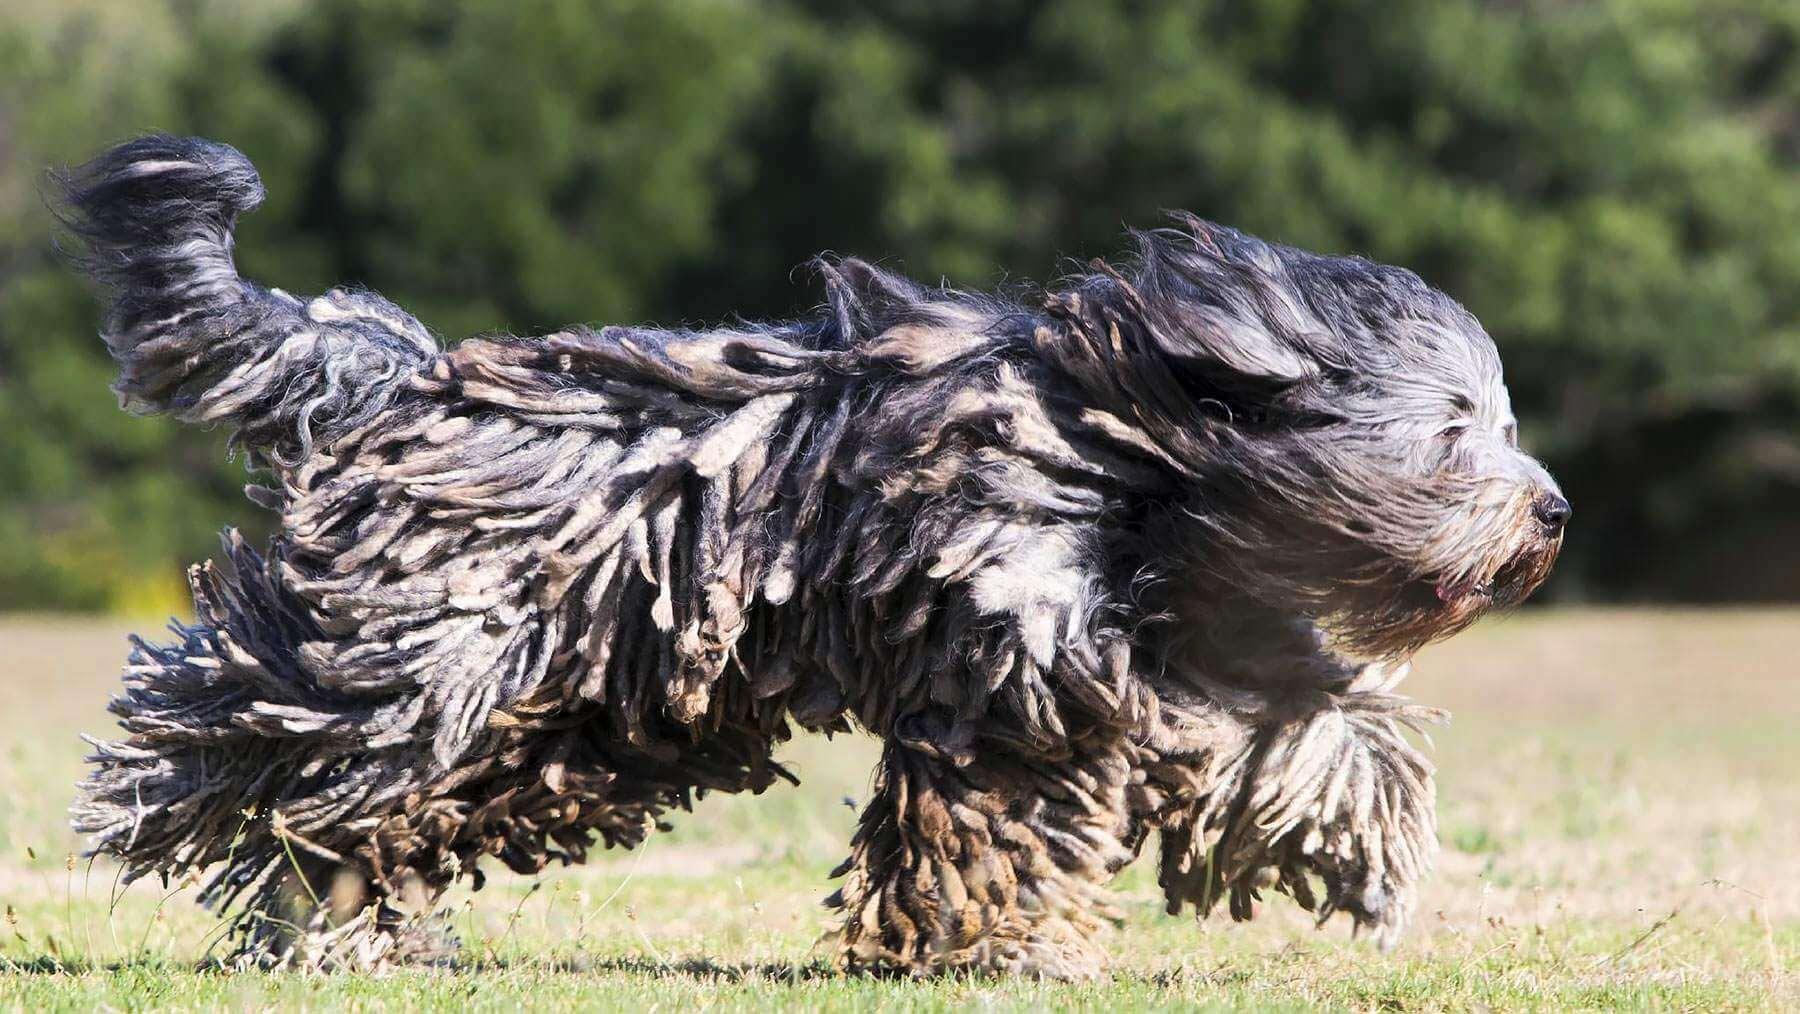 Бладхаунд: описание породы, характер собаки и щенка, фото, цена